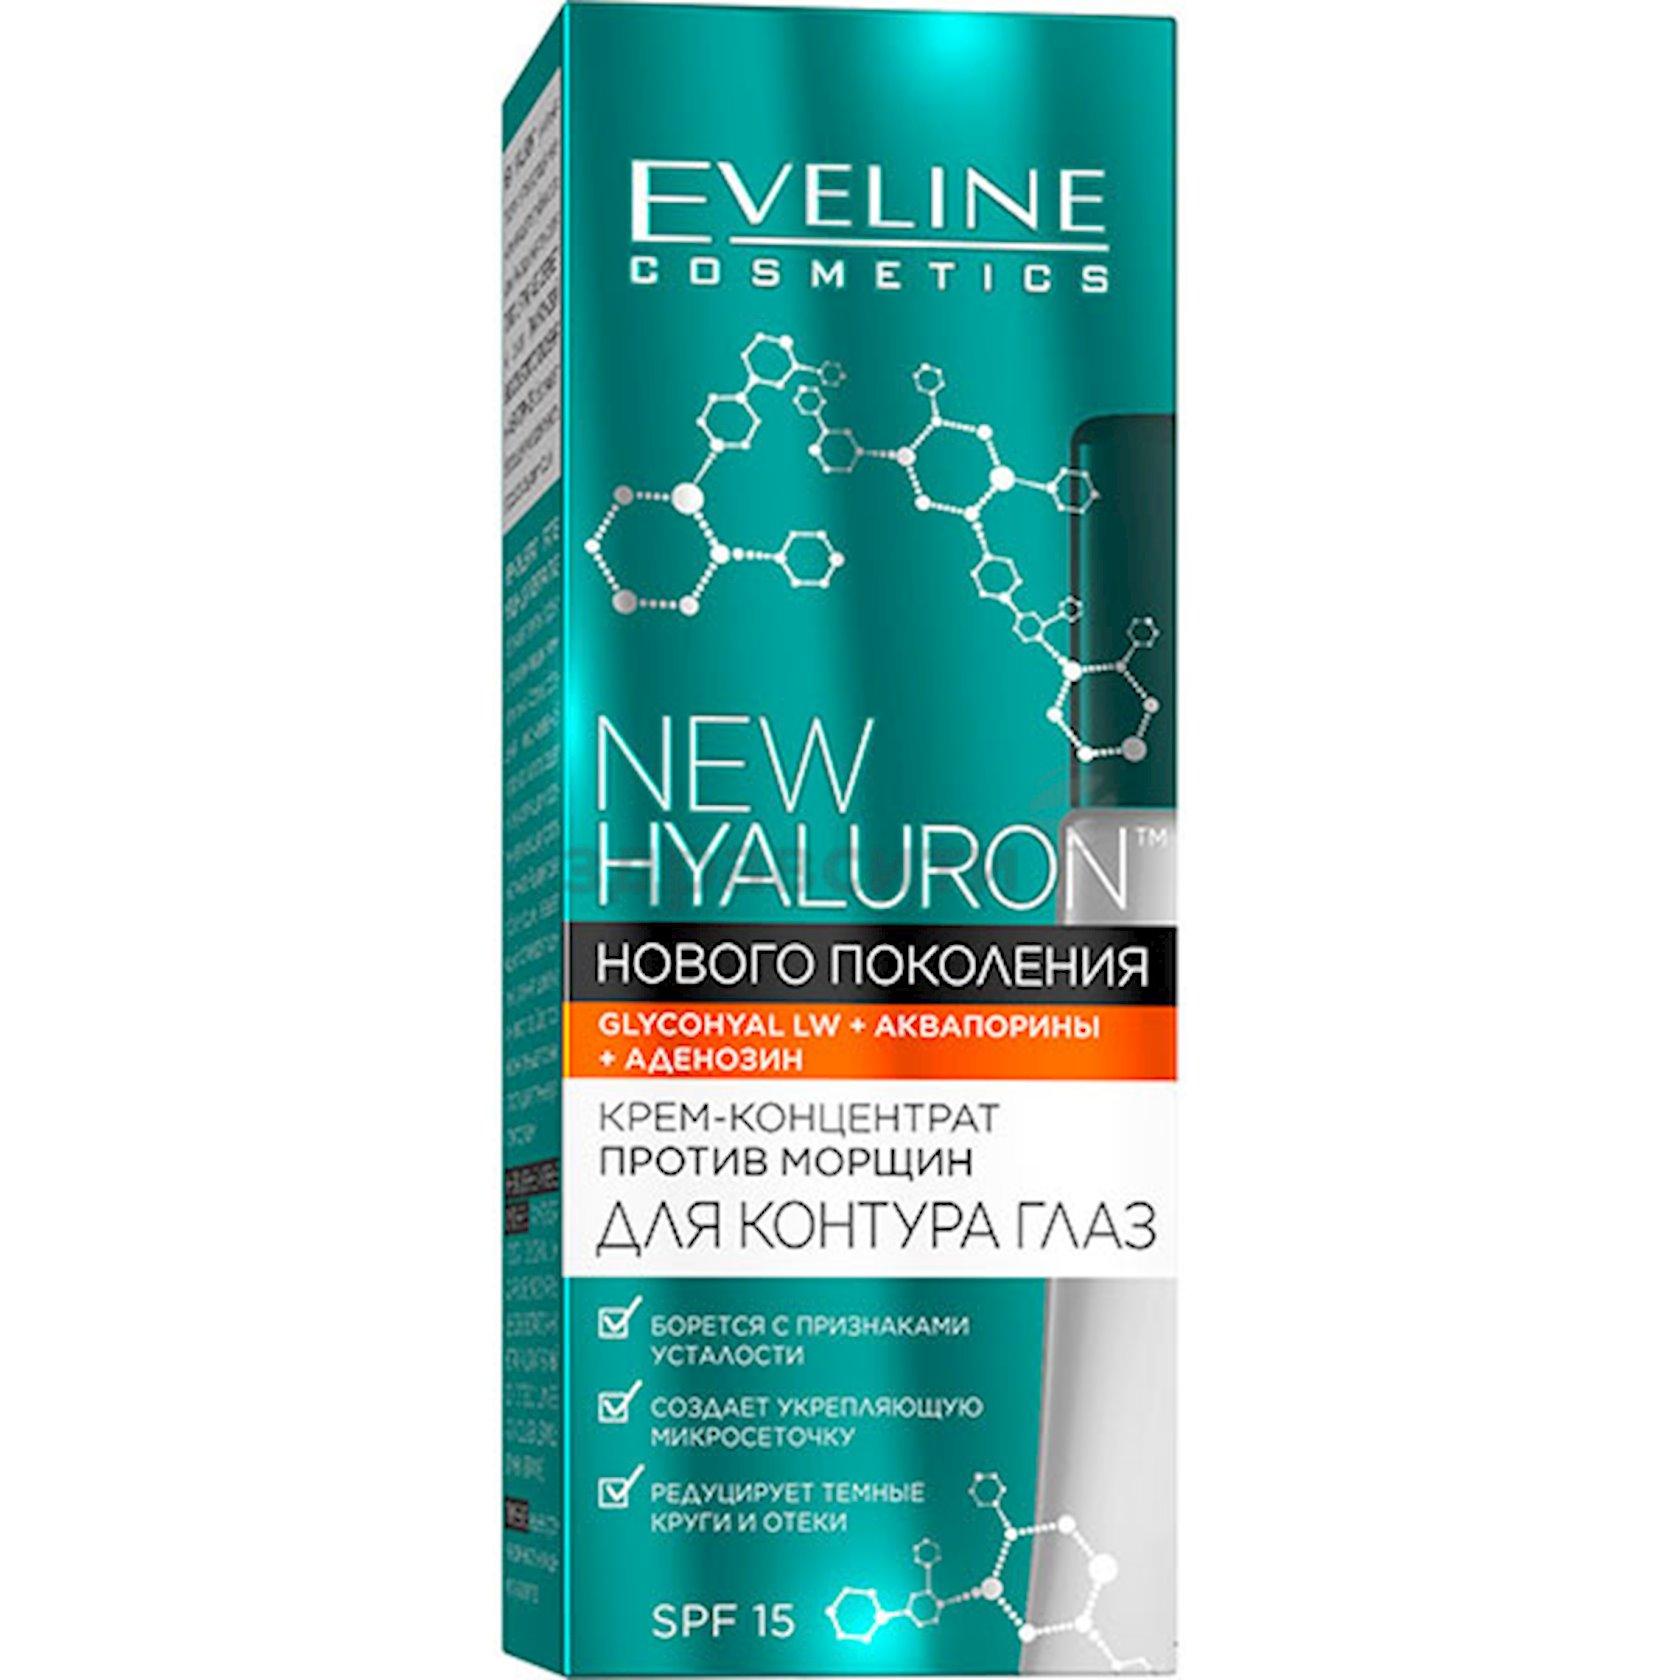 Krem-konsentrant göz konturu üçün Eveline Cosmetics BioHyaluron SPF15